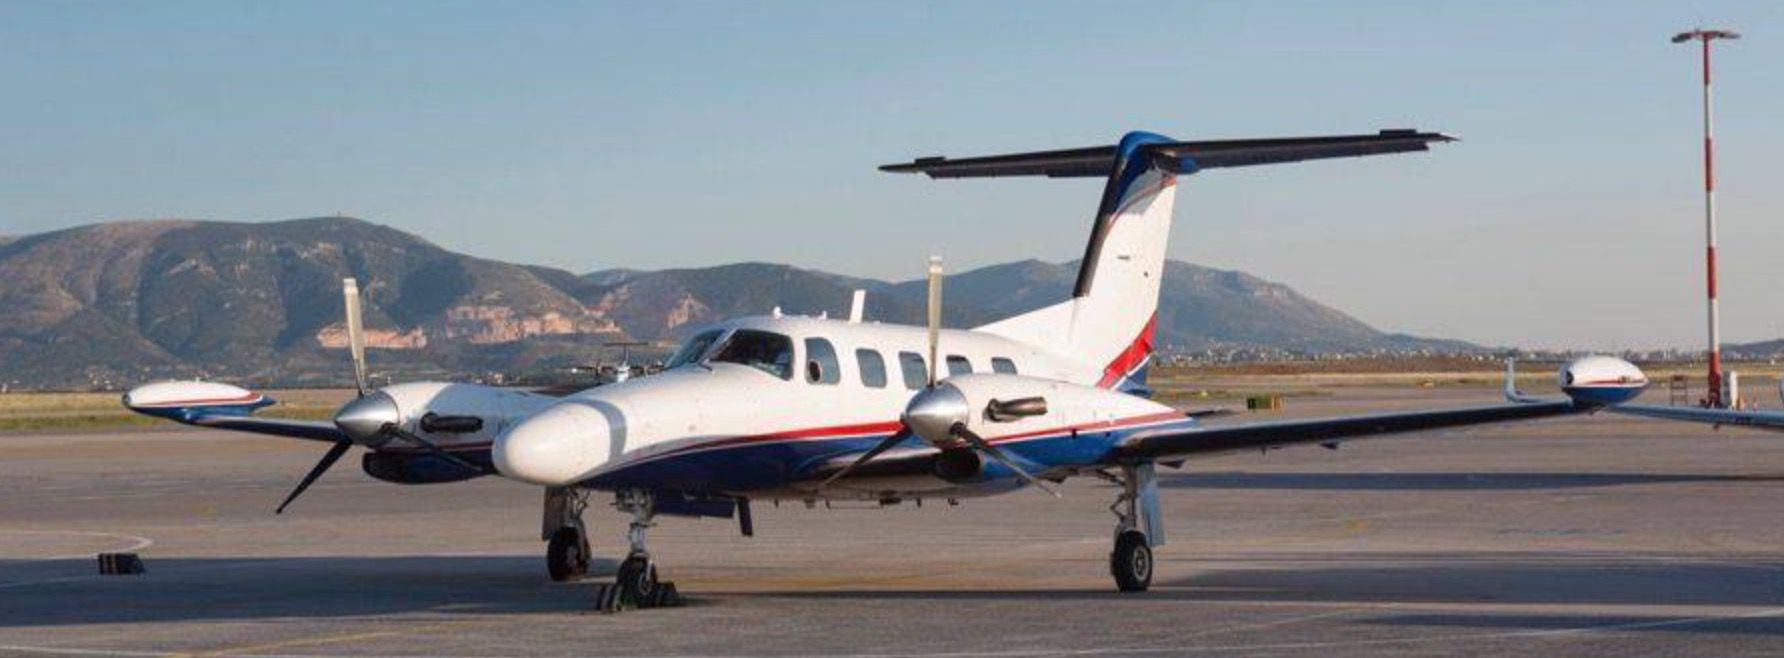 piper-medical-airplane